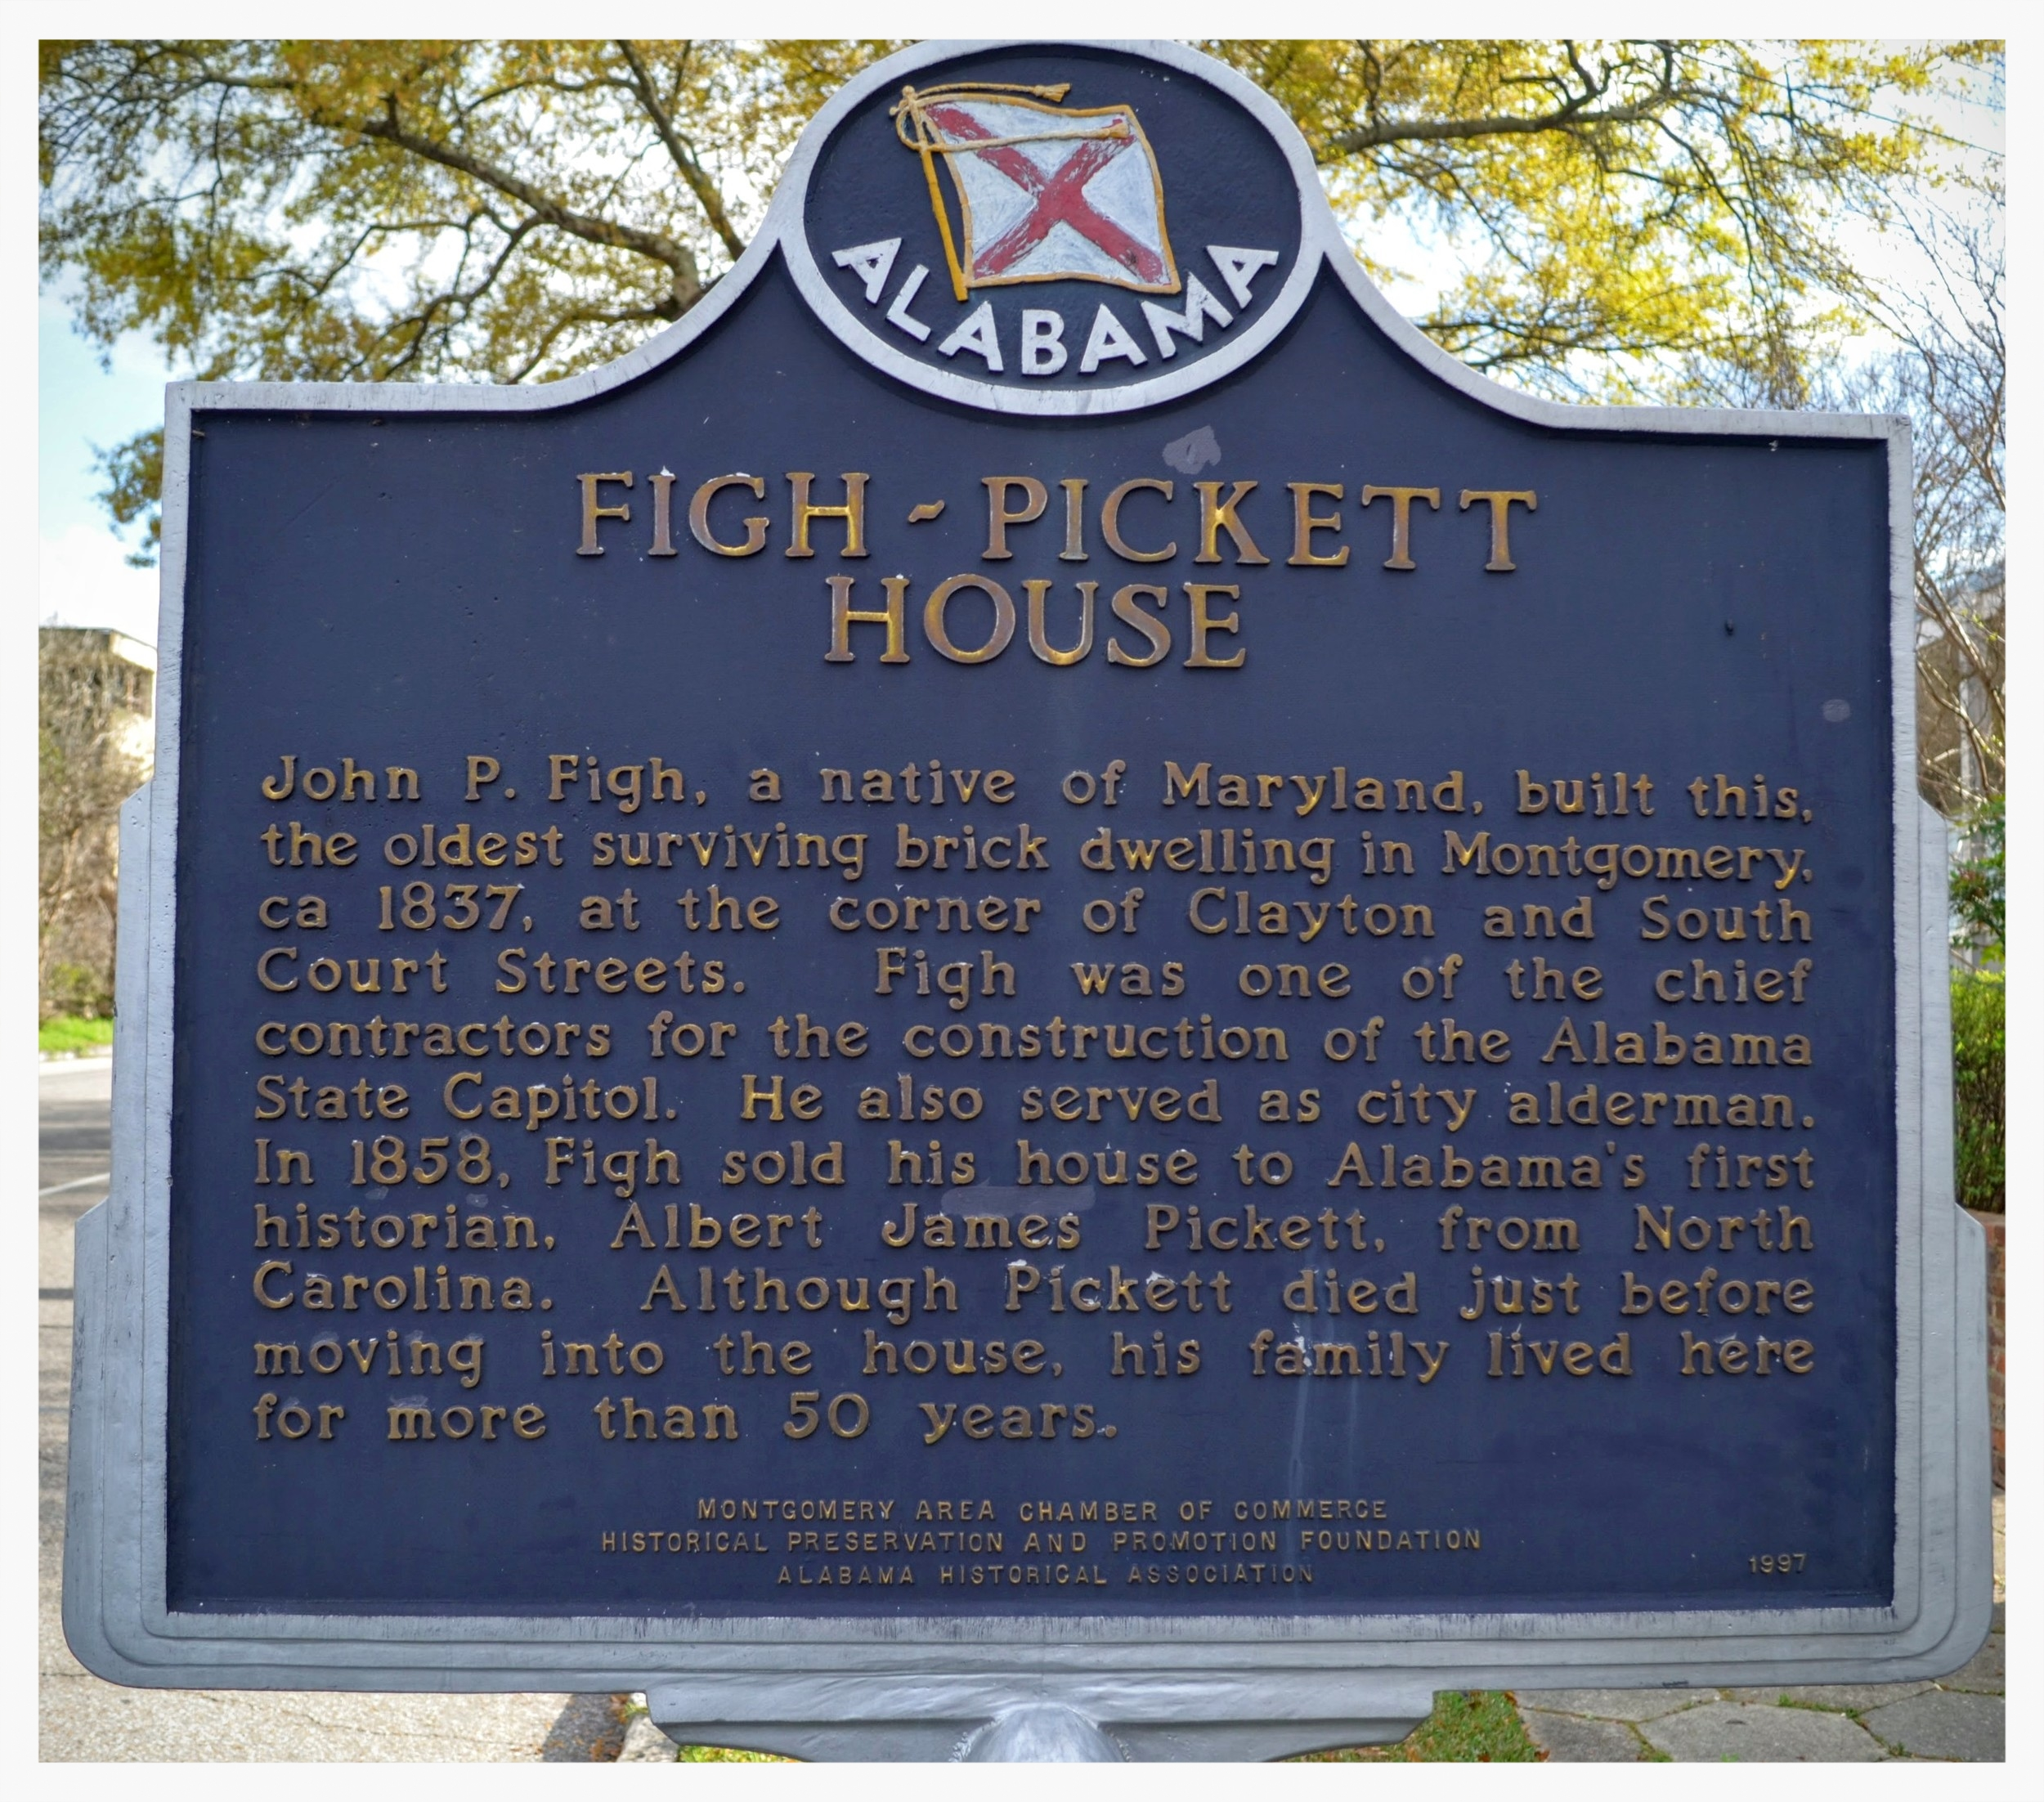 Figh-Pickett House historical marker, Montgomery, Montgomery County, Alabama